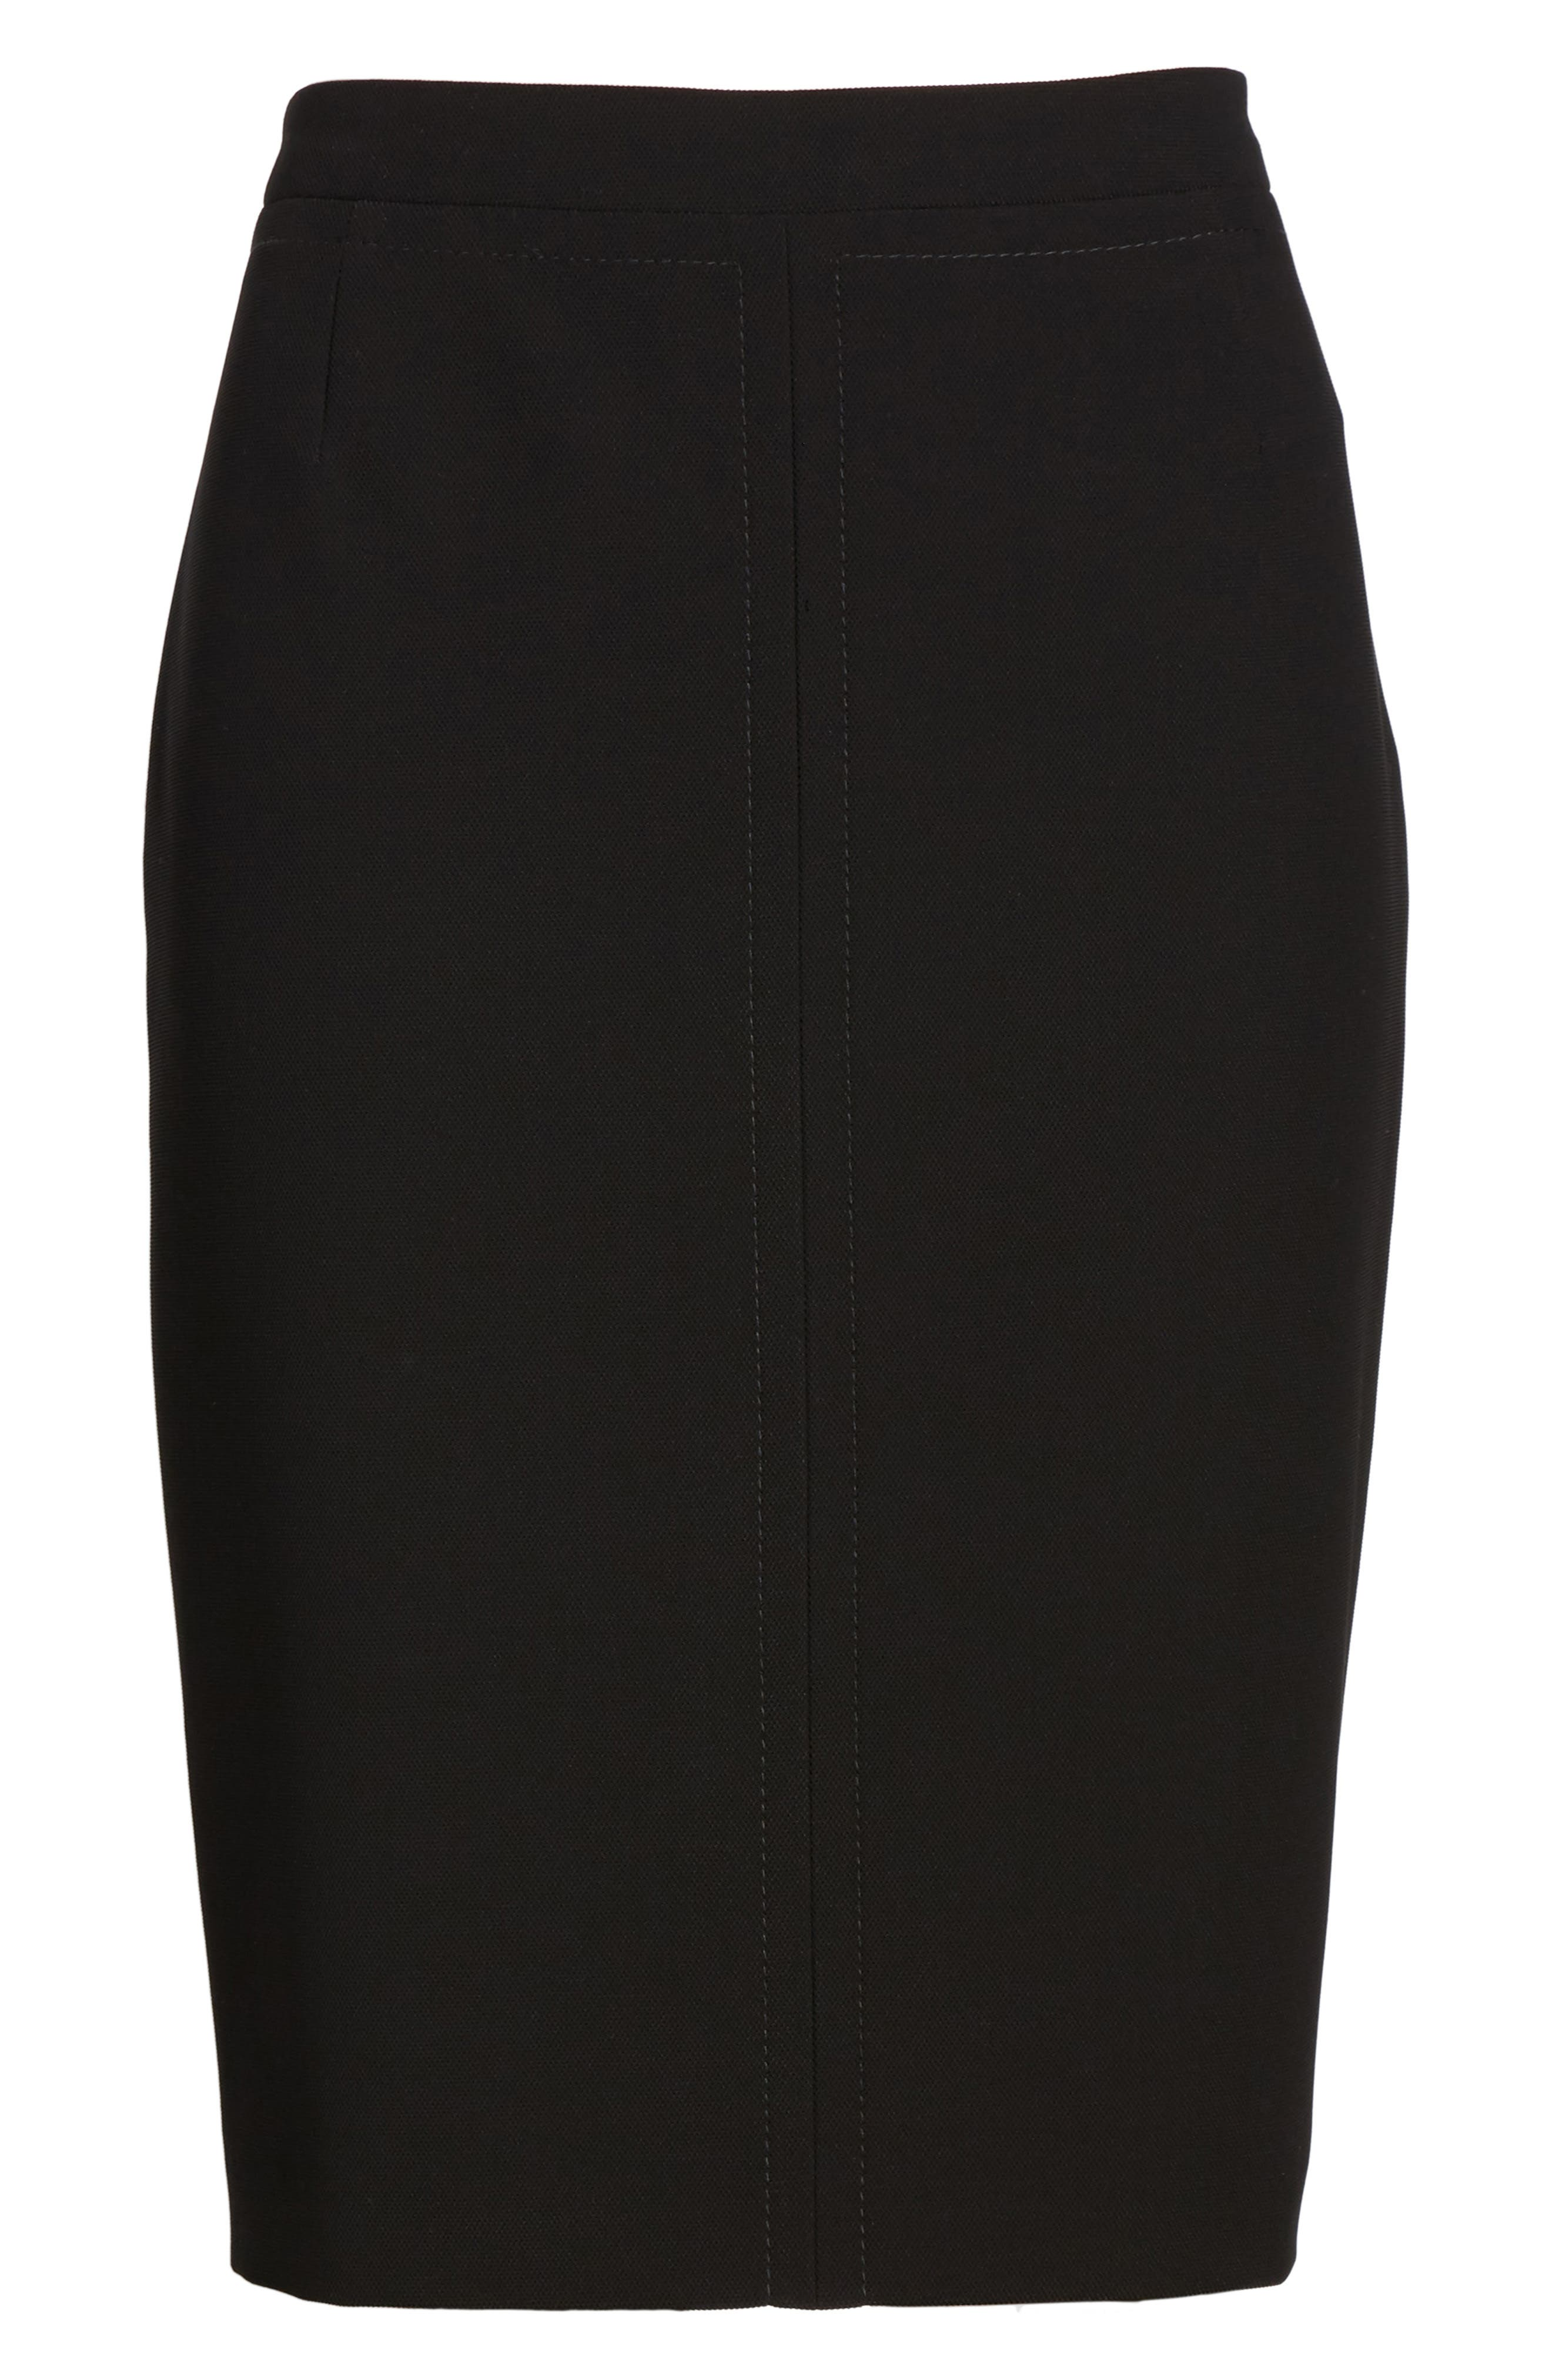 Vuriona Pencil Skirt,                             Alternate thumbnail 6, color,                             001